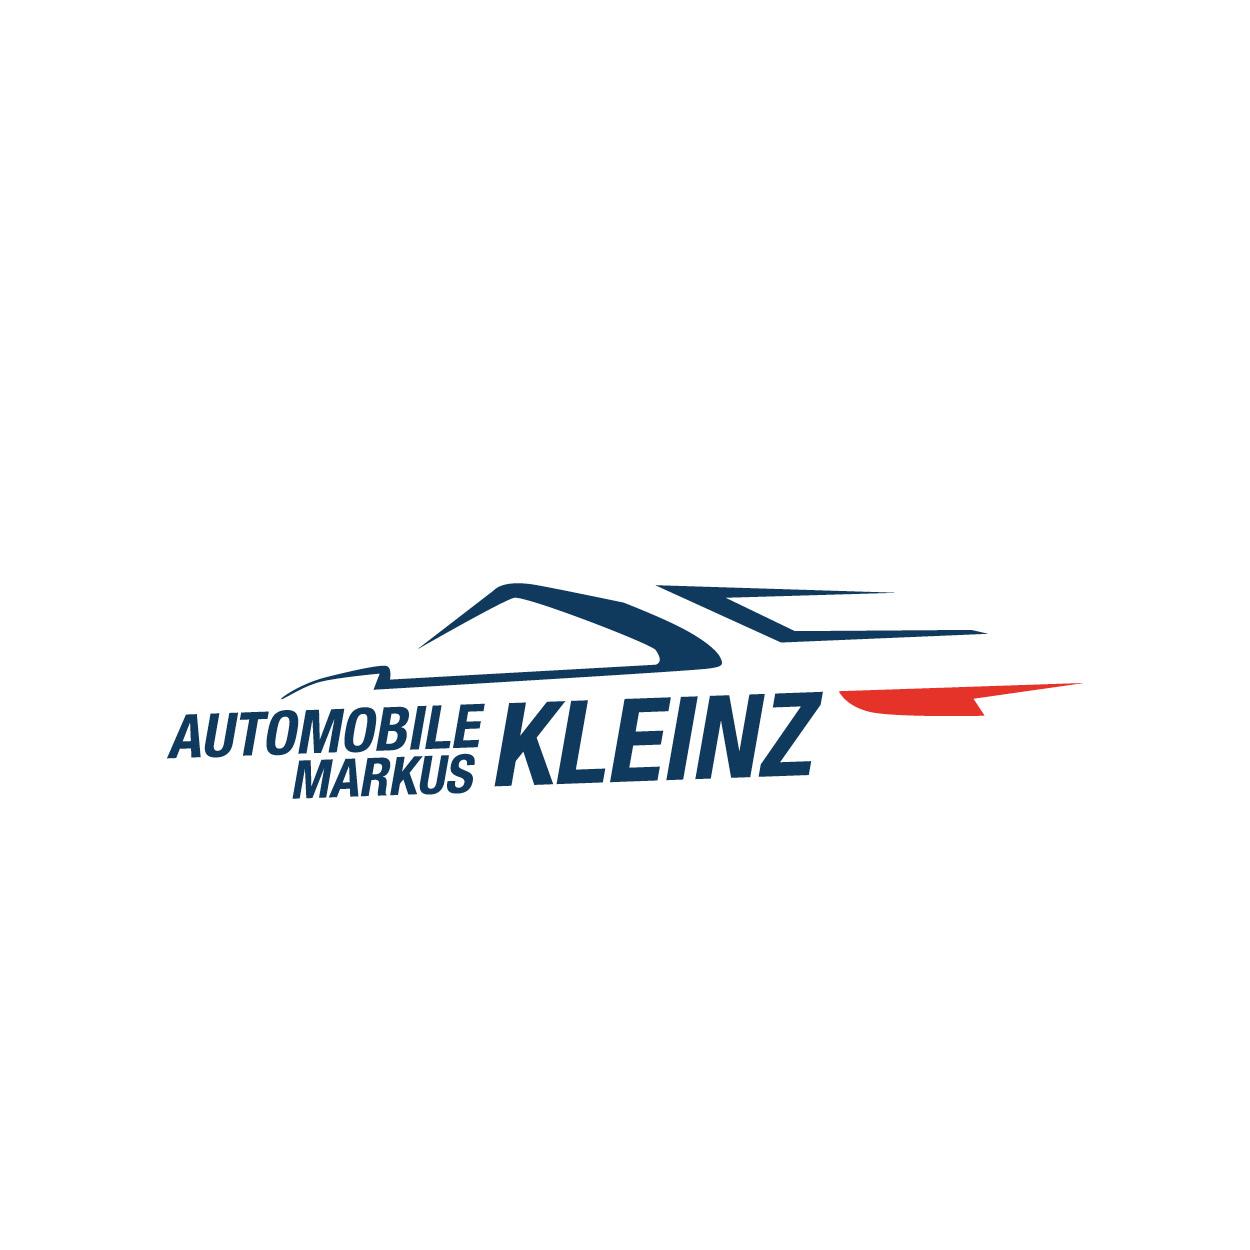 Automobile Markus Kleinz